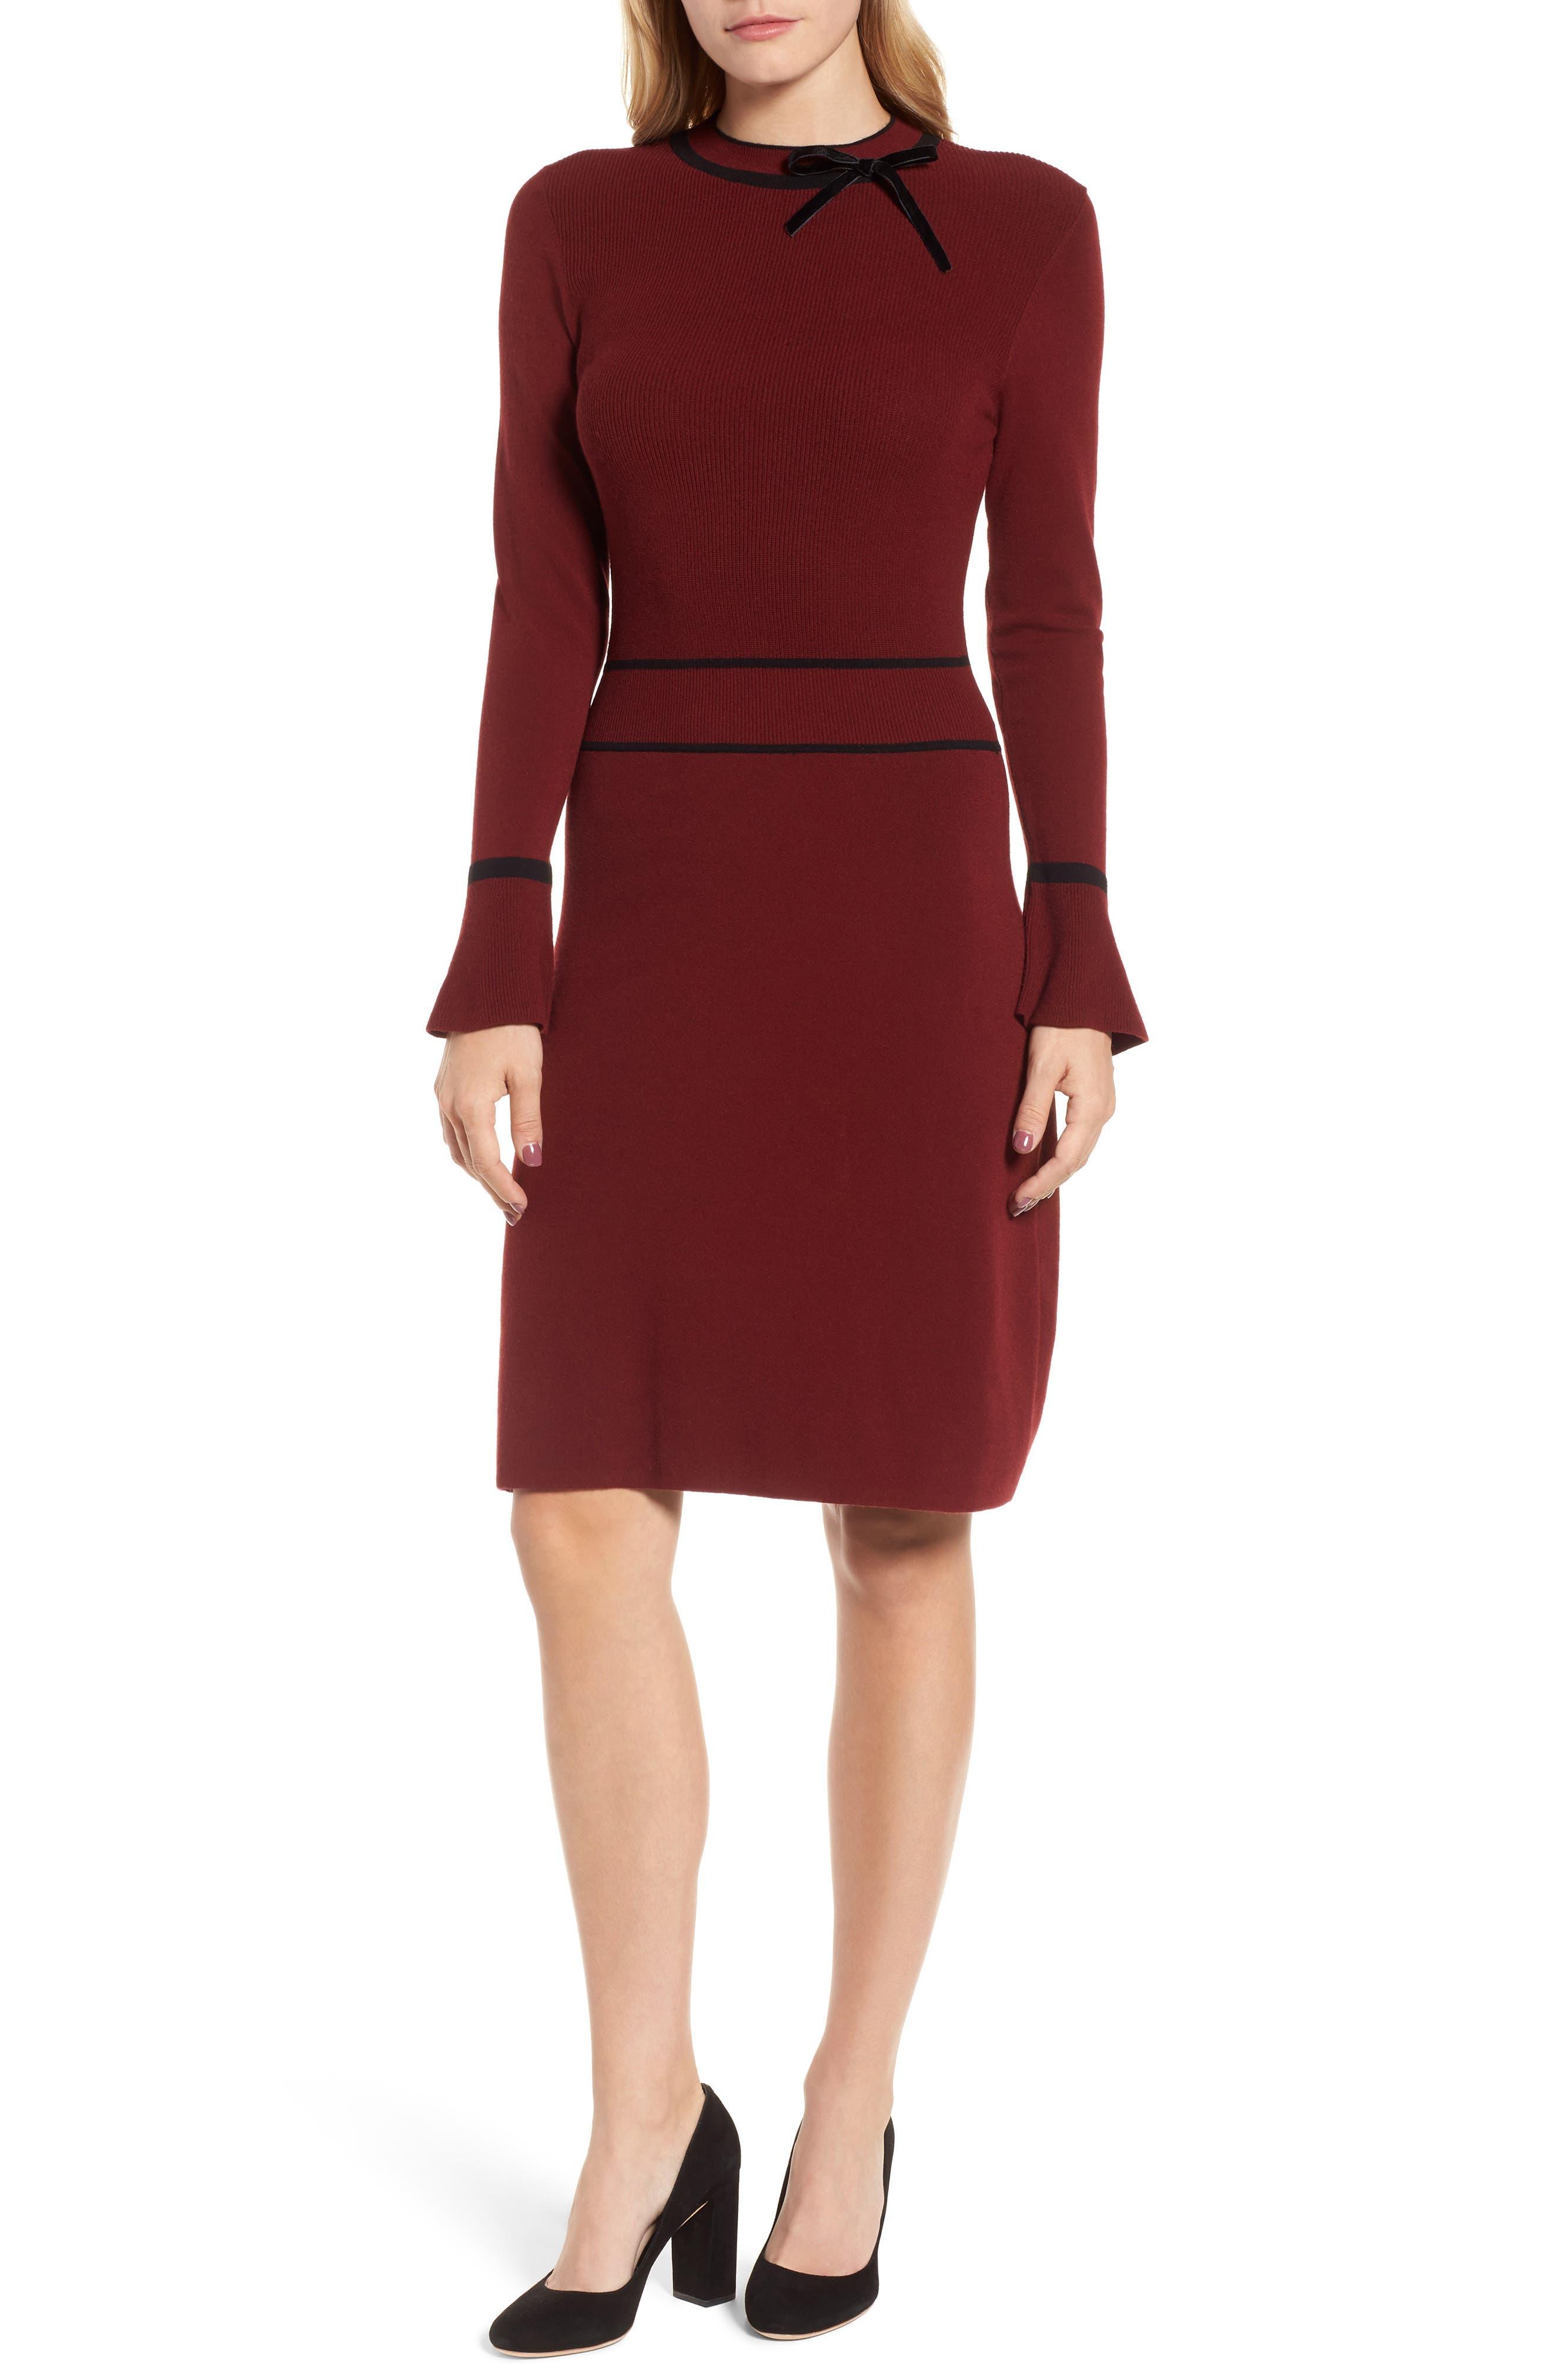 Draper James Annabeth Sweater Dress